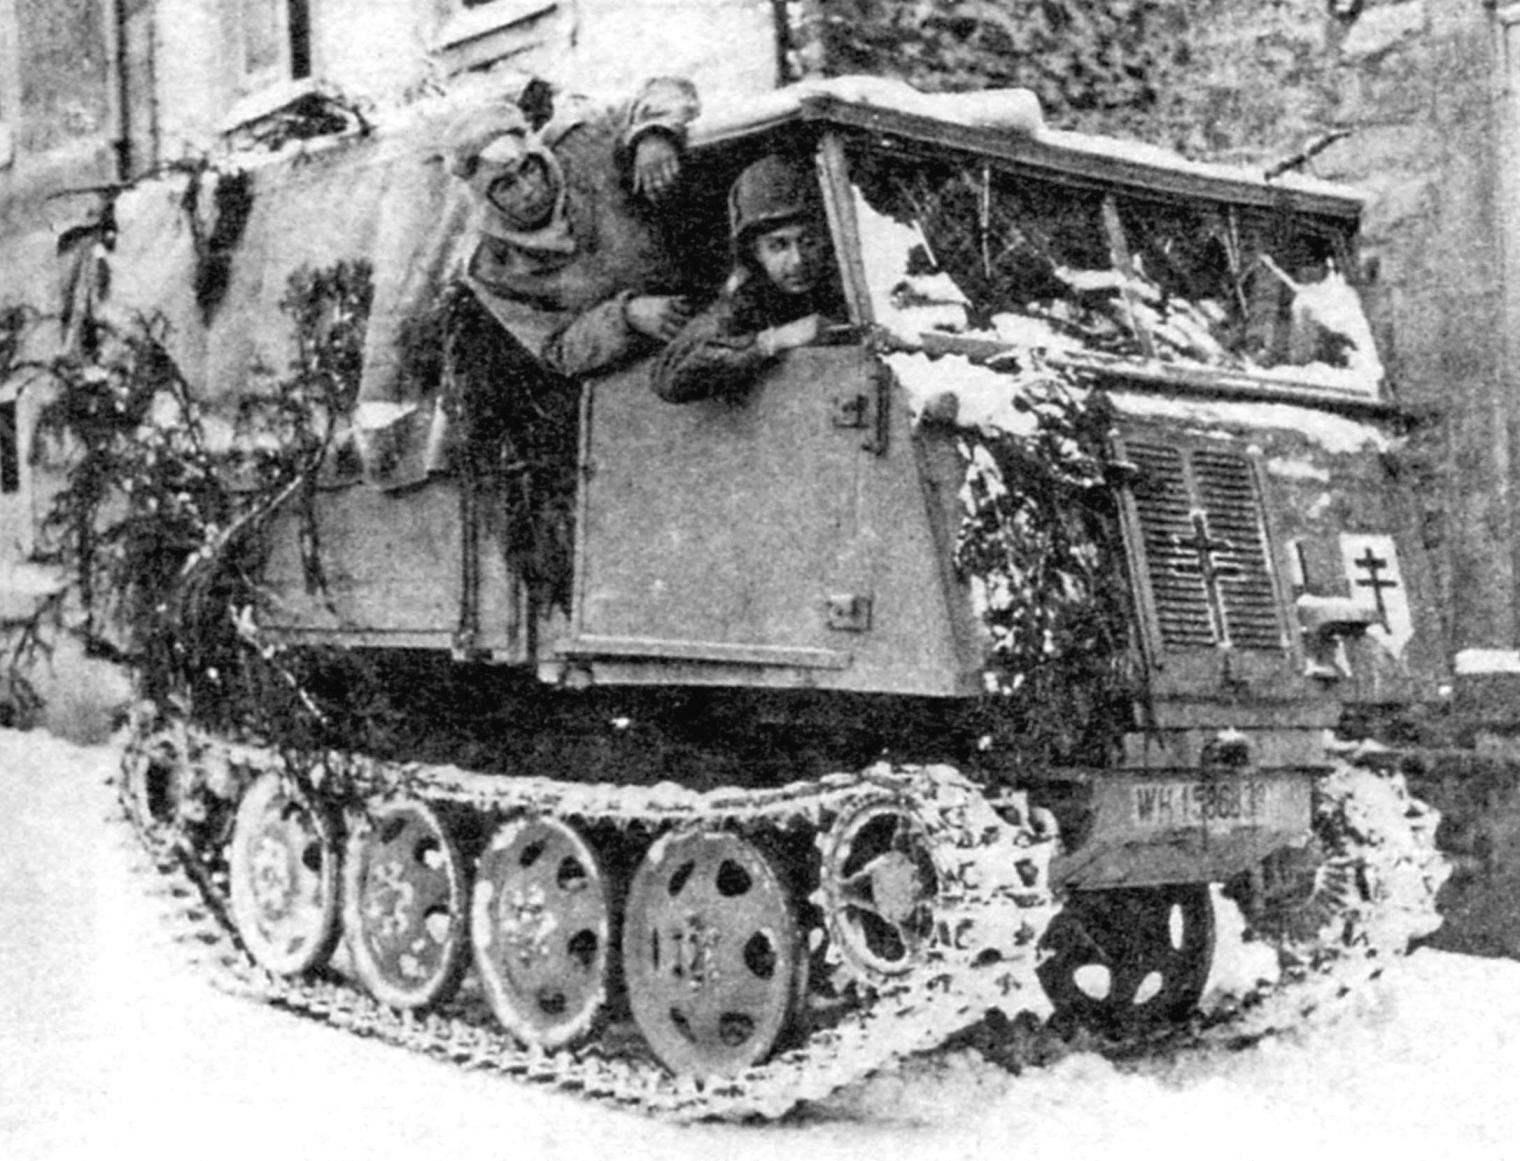 Raupenschlepper Ost (сокращённо RSO) в переводе буквально означало «трактор, следующий на Восток». Считалось, что такое название дал Гитлер. На фото: RSO на Восточном фронте. Зима 1943 г.